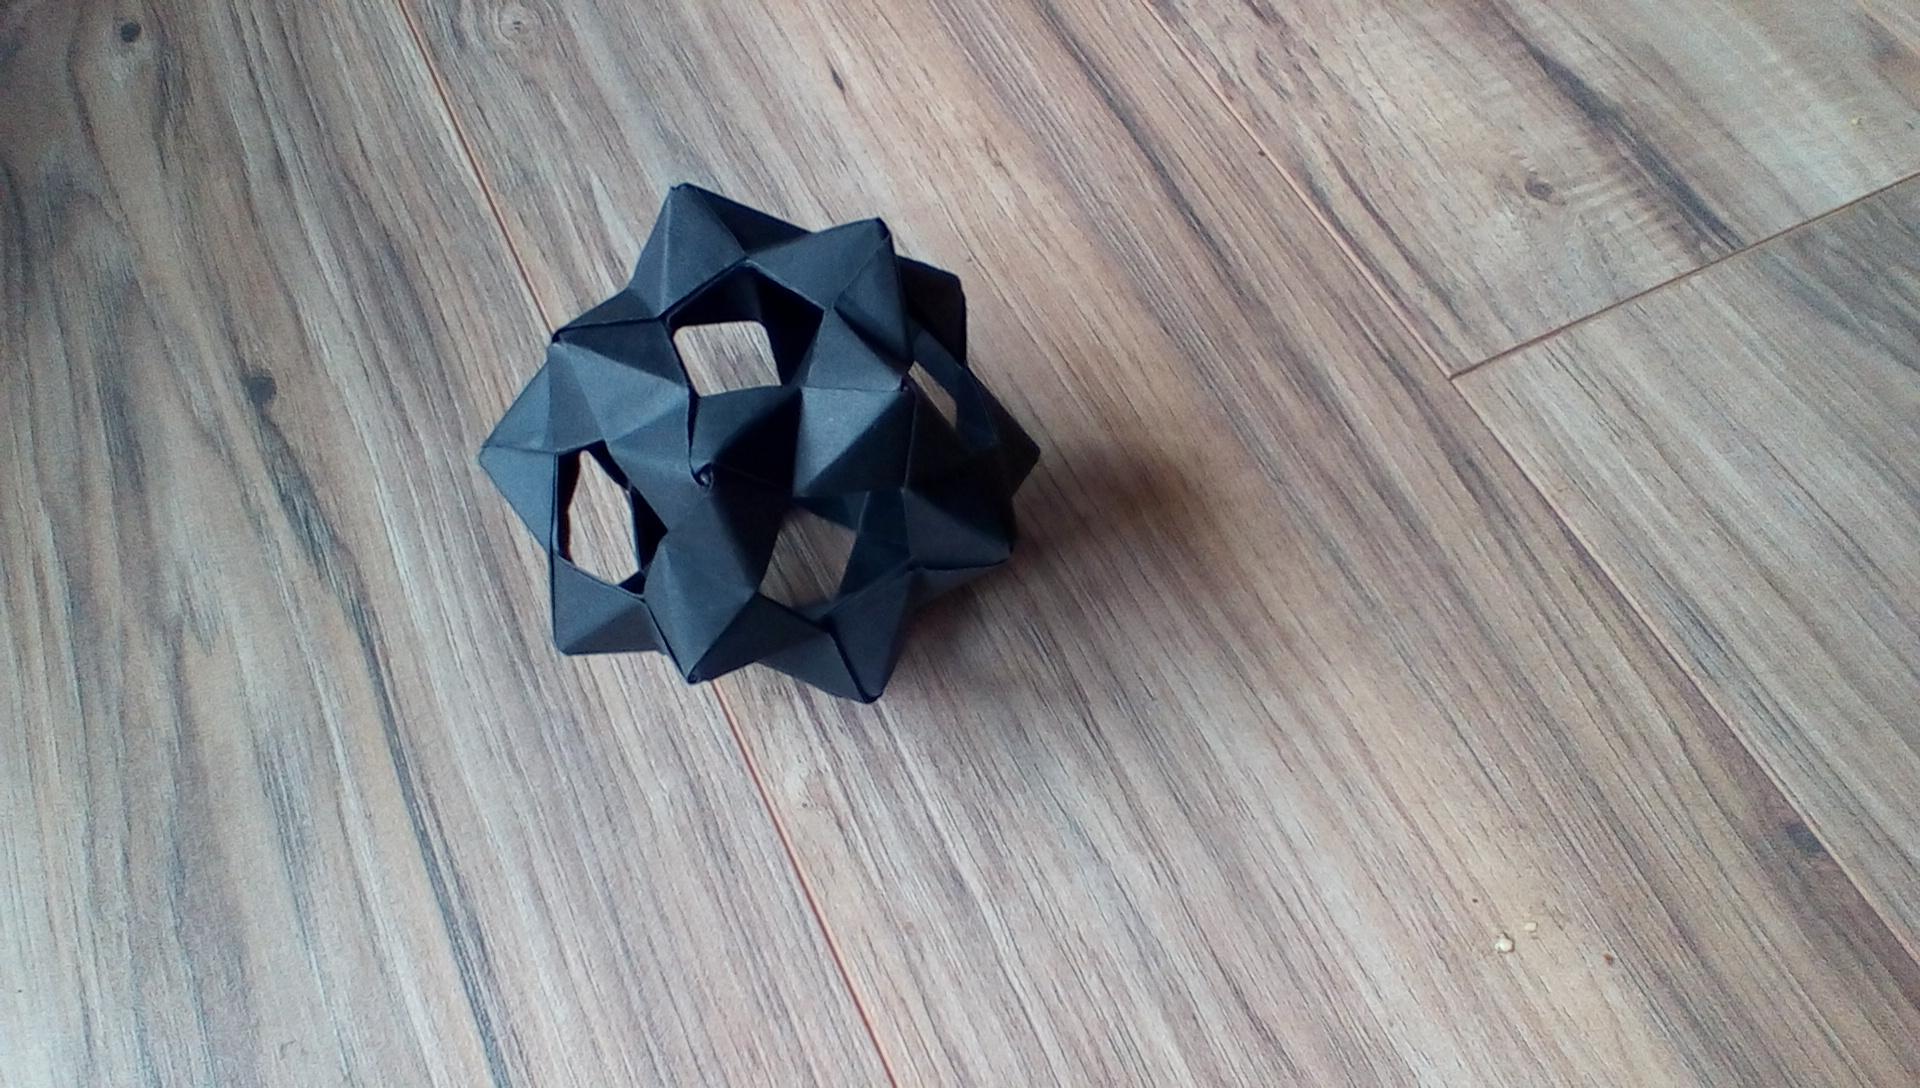 30 Unit PHiZZ Ball (modular Origami)